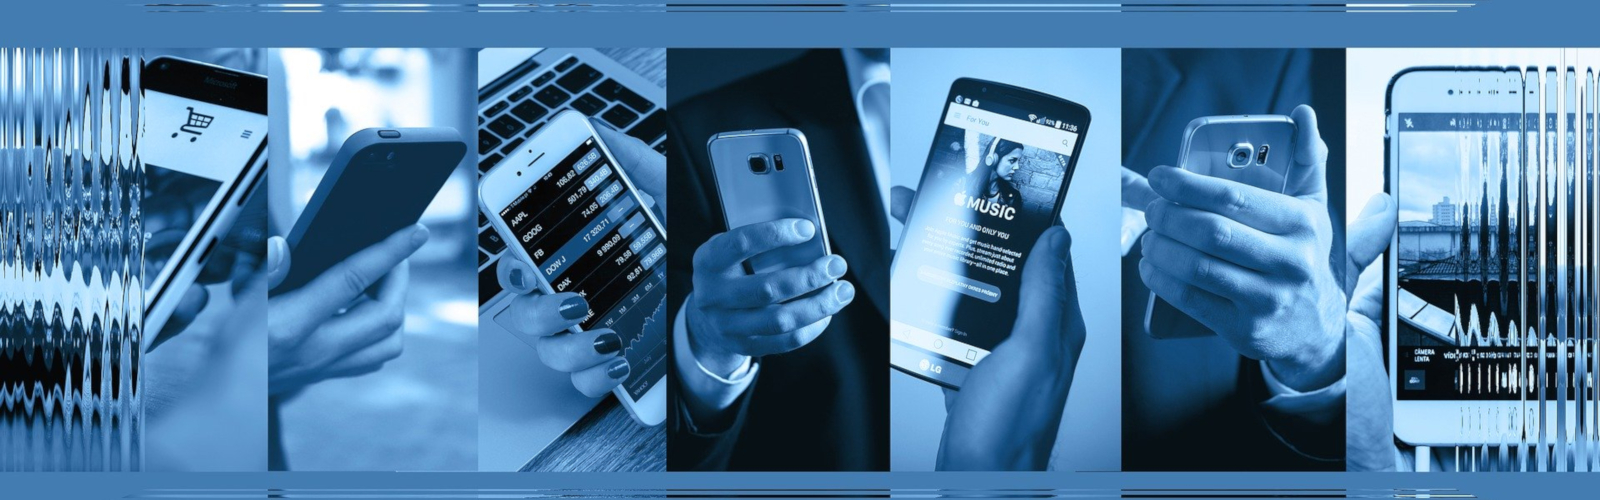 divers smartphone